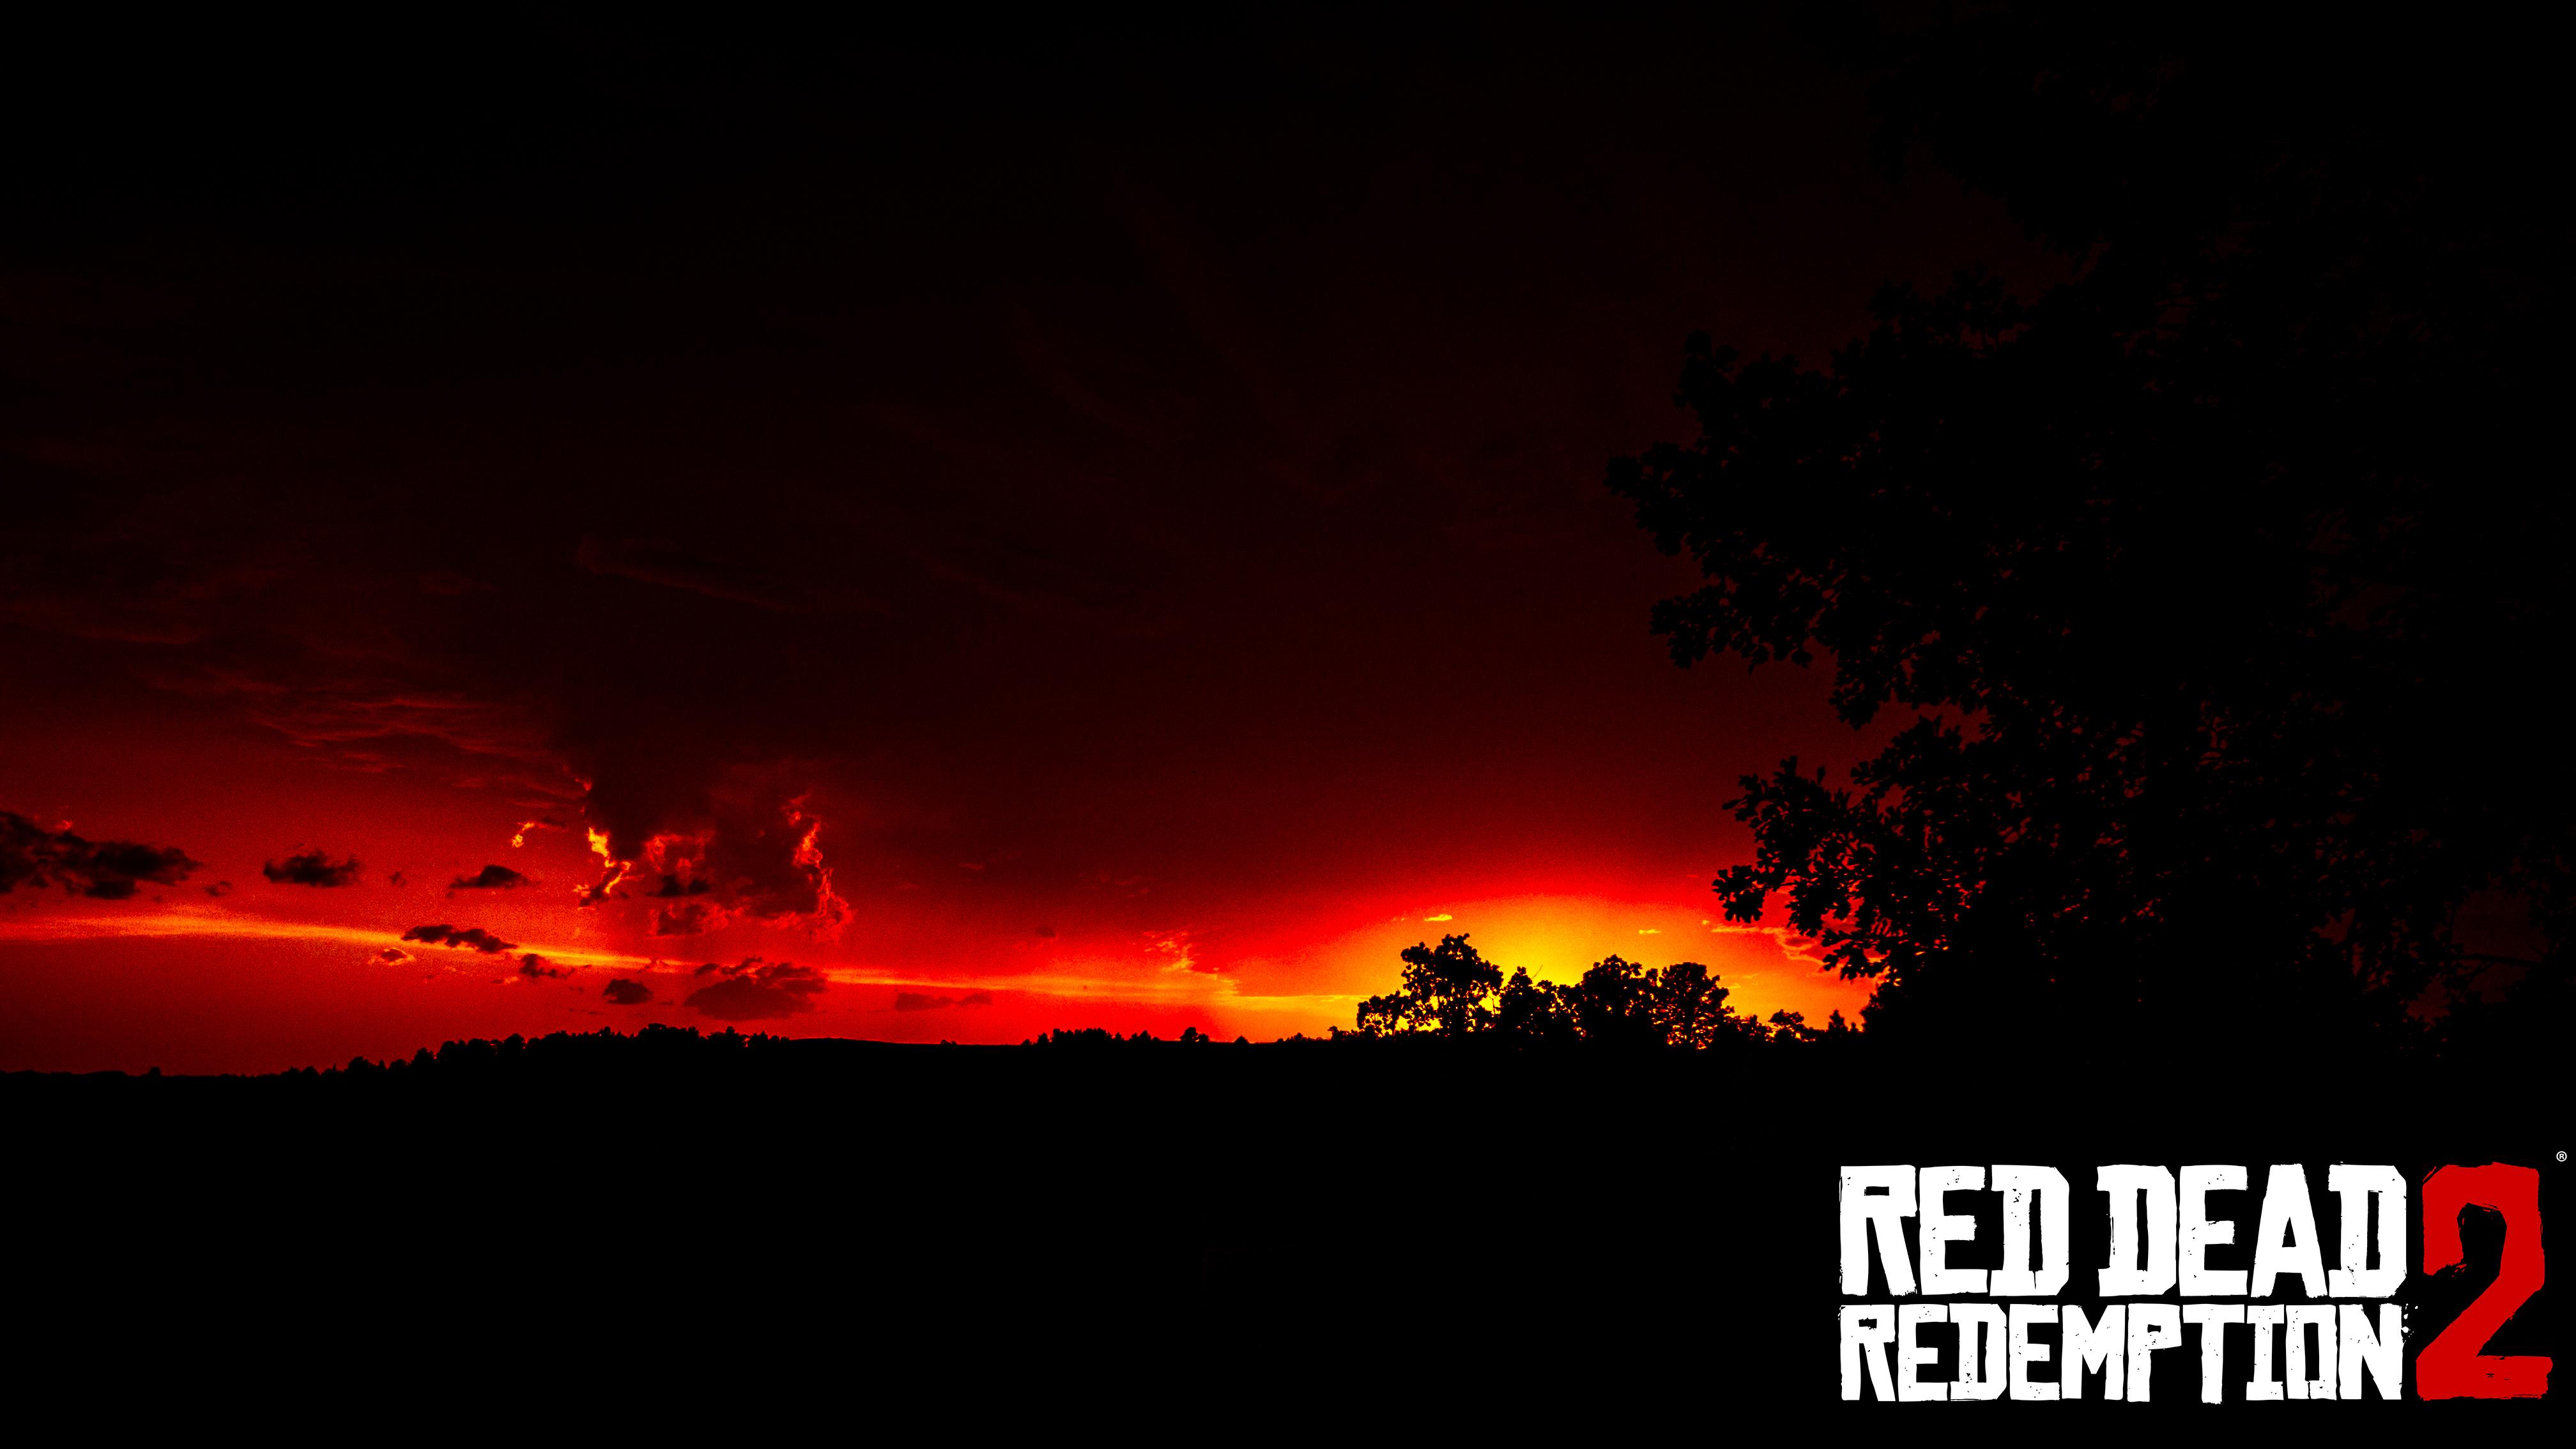 Red Dead Redemption 2 Wallpapers 15 Images for your desktop